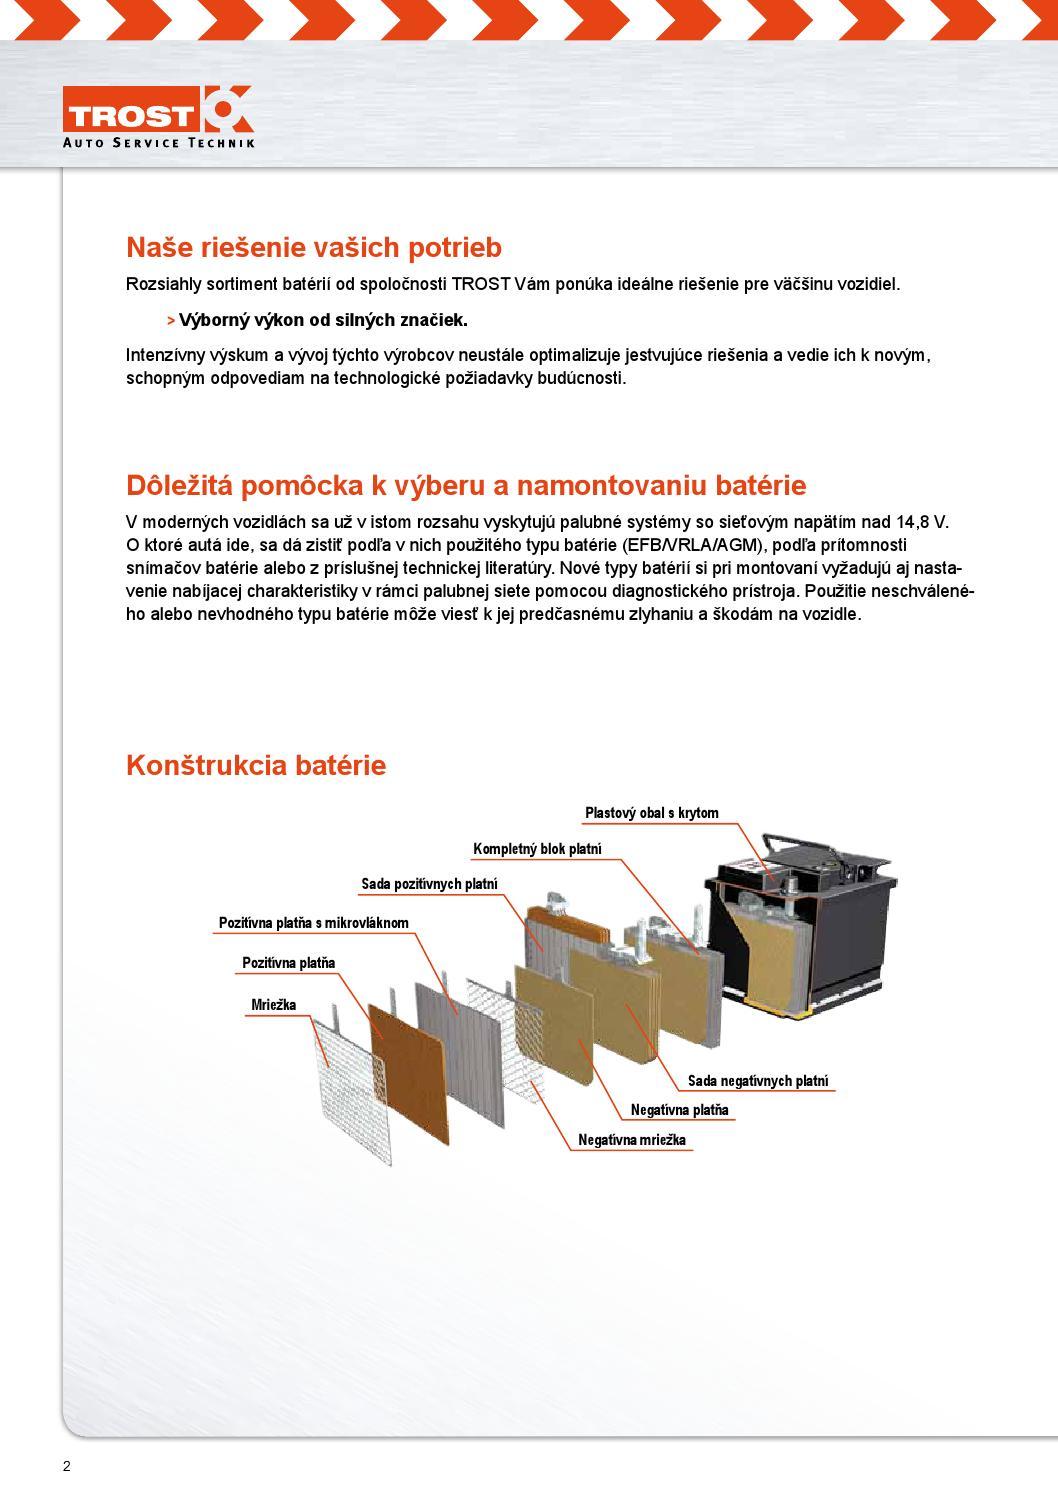 trost katalog autobaterii 2014 2015 by trost auto service. Black Bedroom Furniture Sets. Home Design Ideas